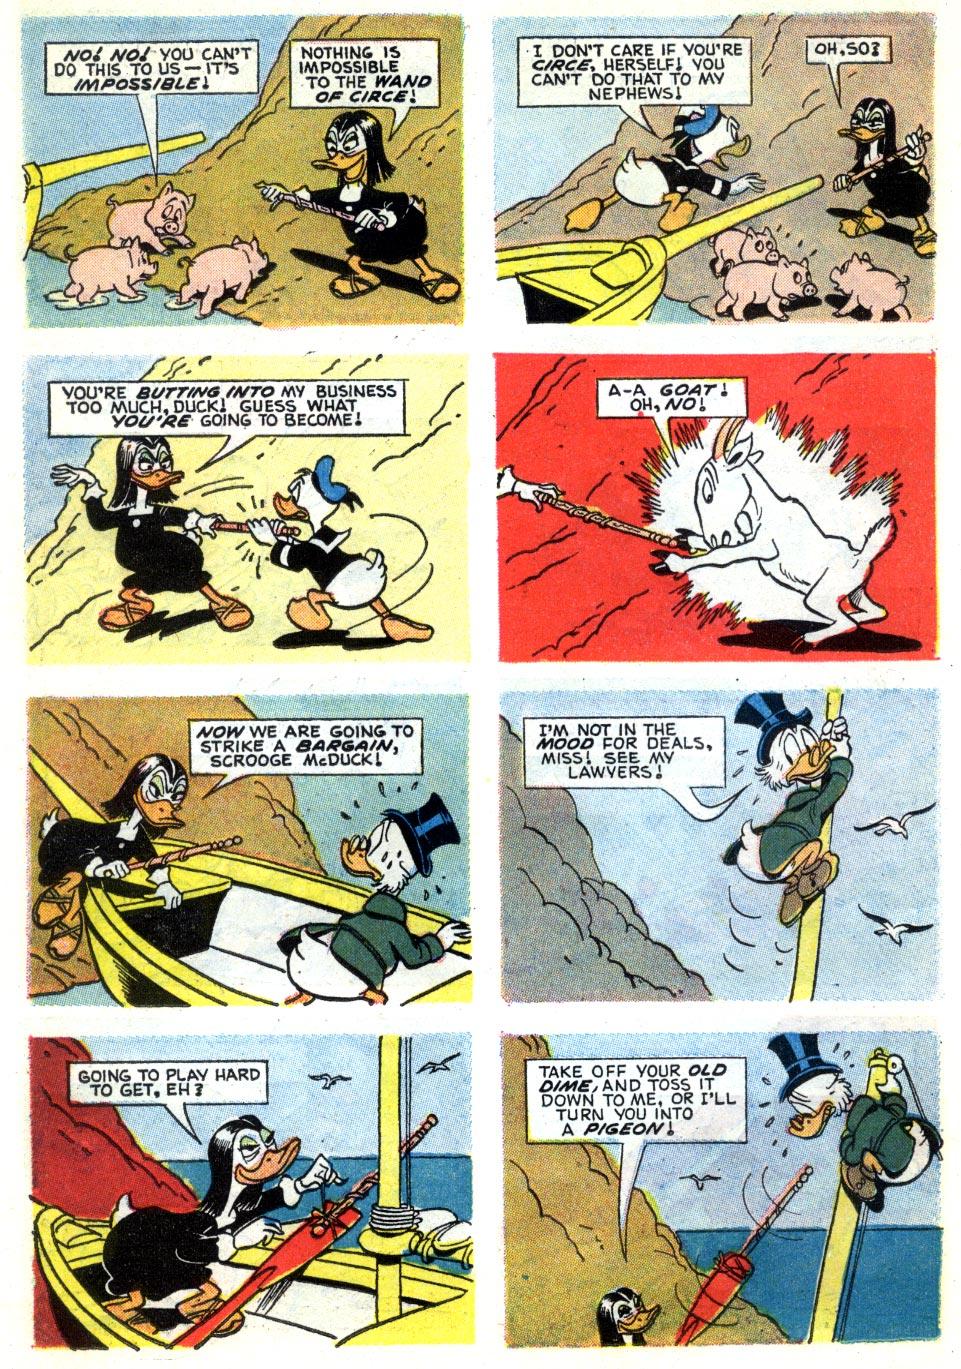 (1953) Issue #329 </opti #365 - English 14